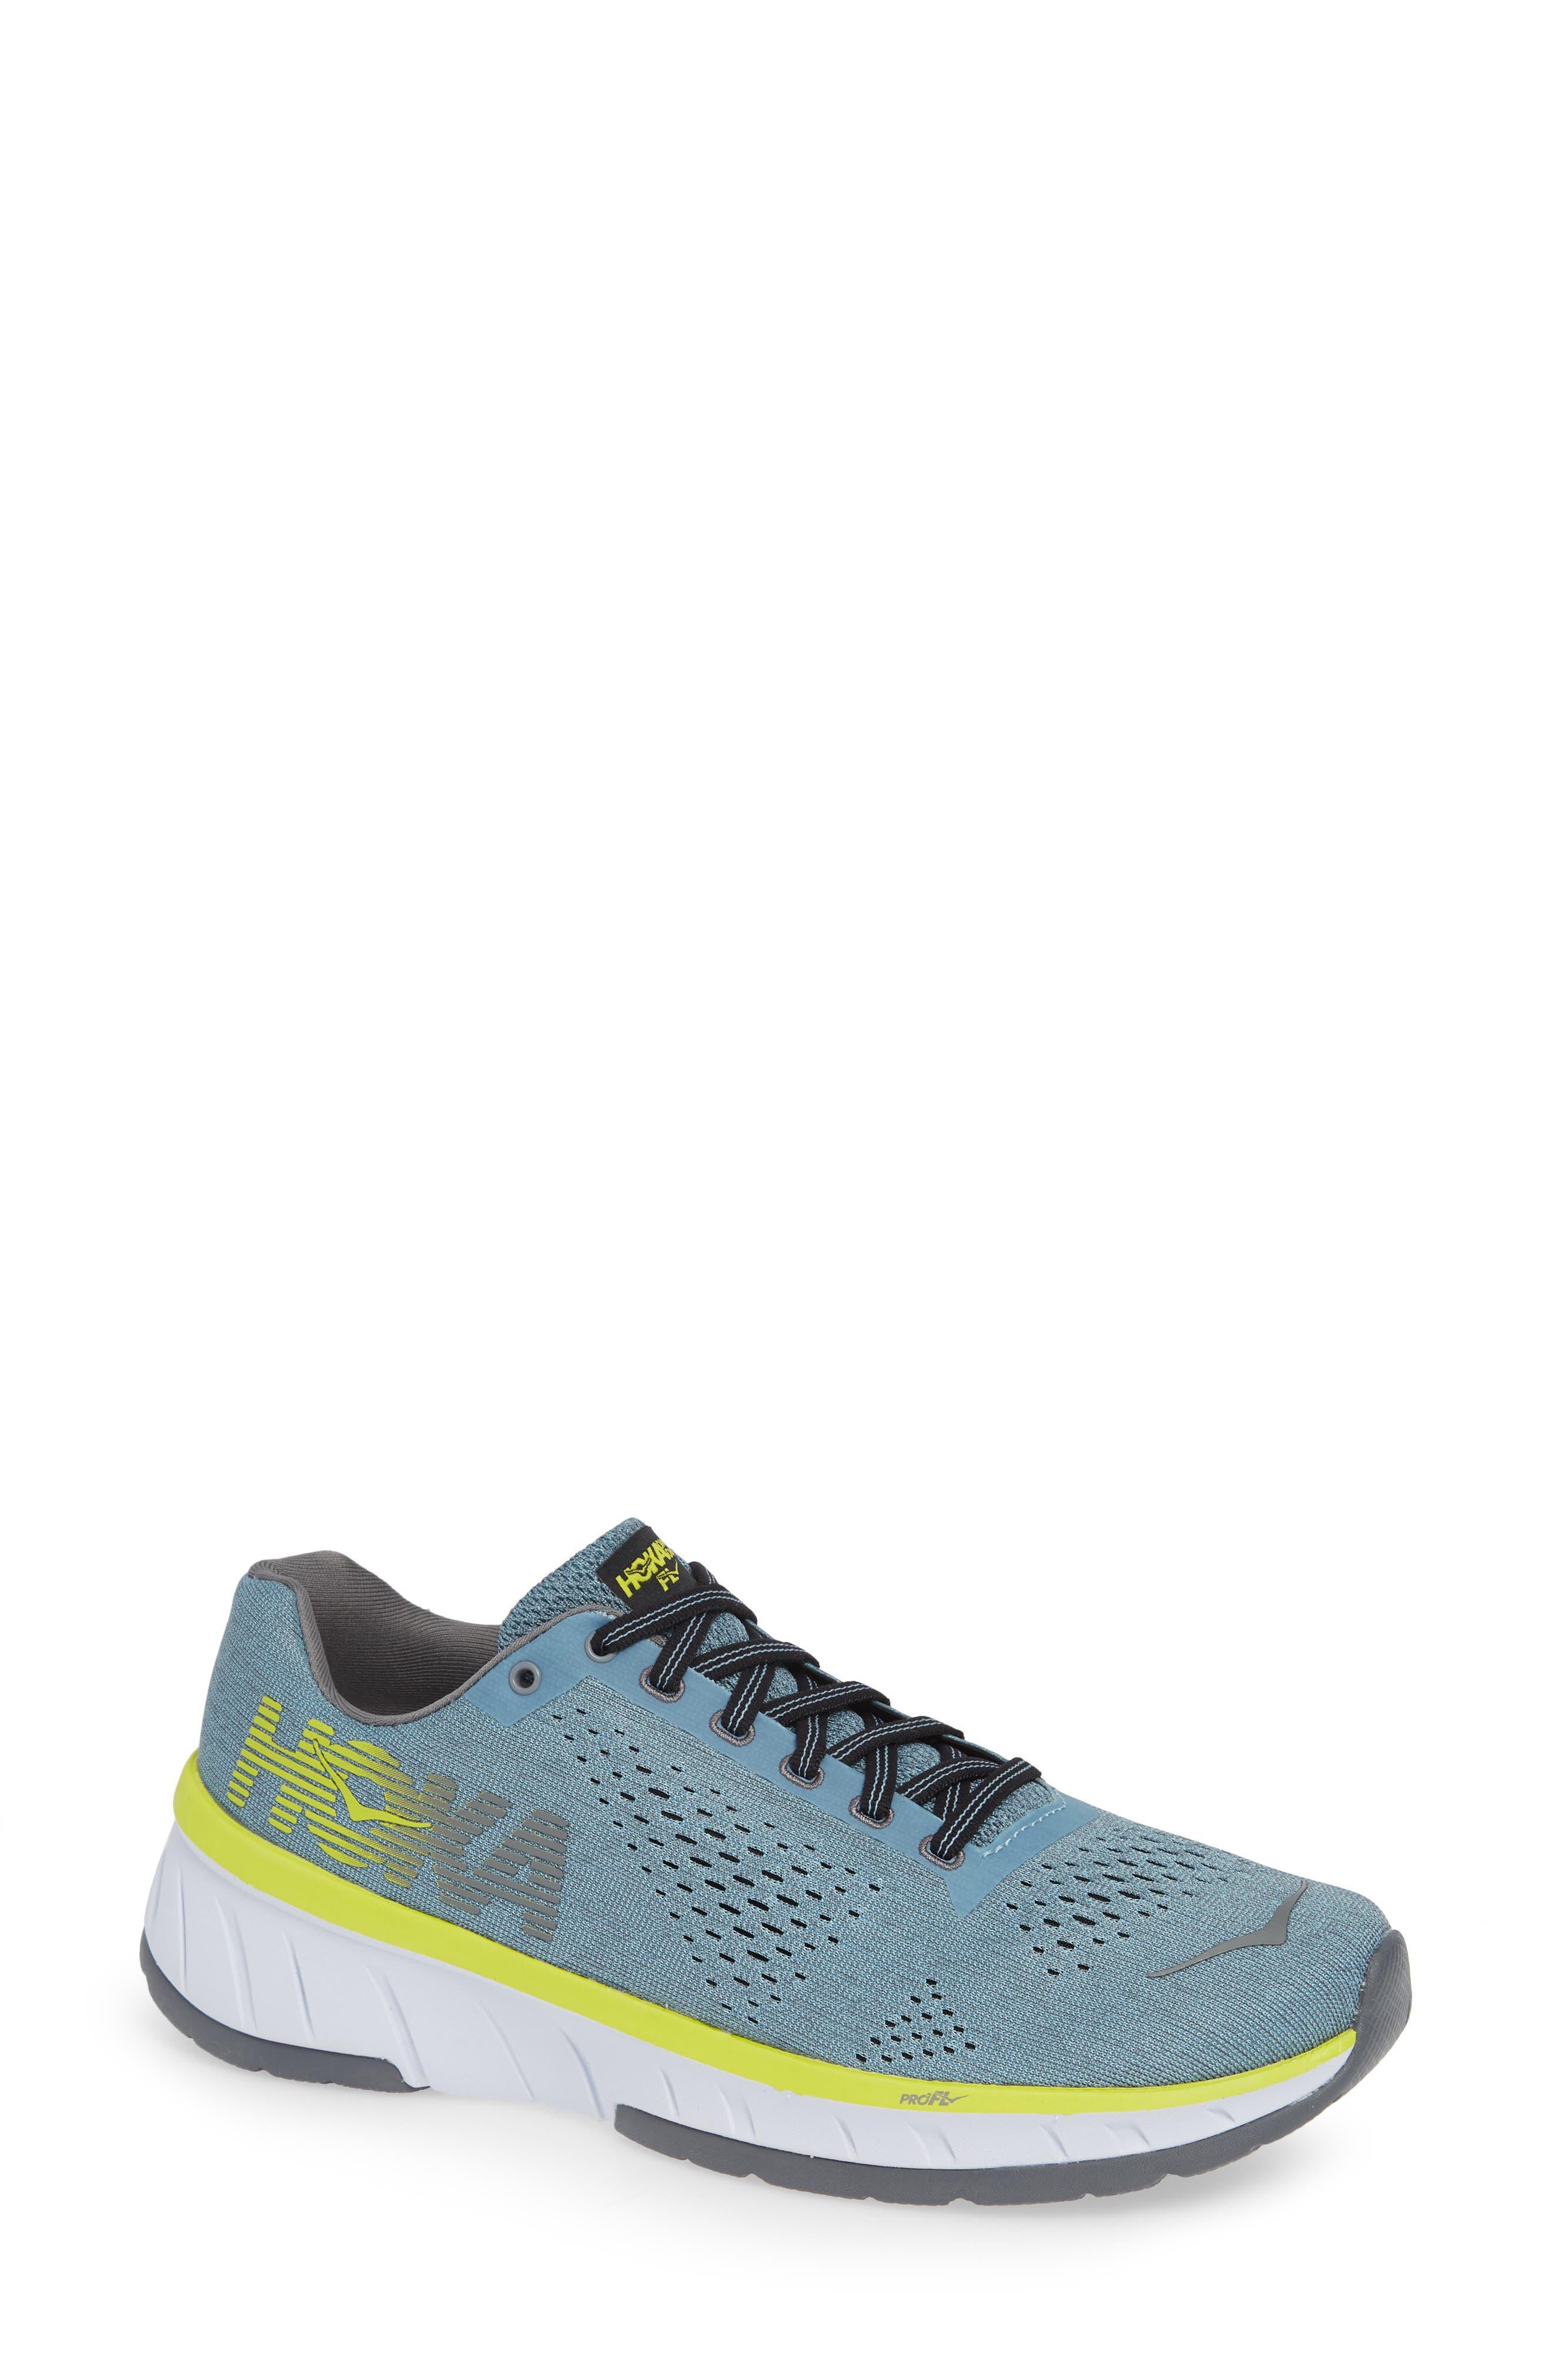 Cavu Running Shoe,                         Main,                         color, SKY BLUE/ NEUTRAL GREY